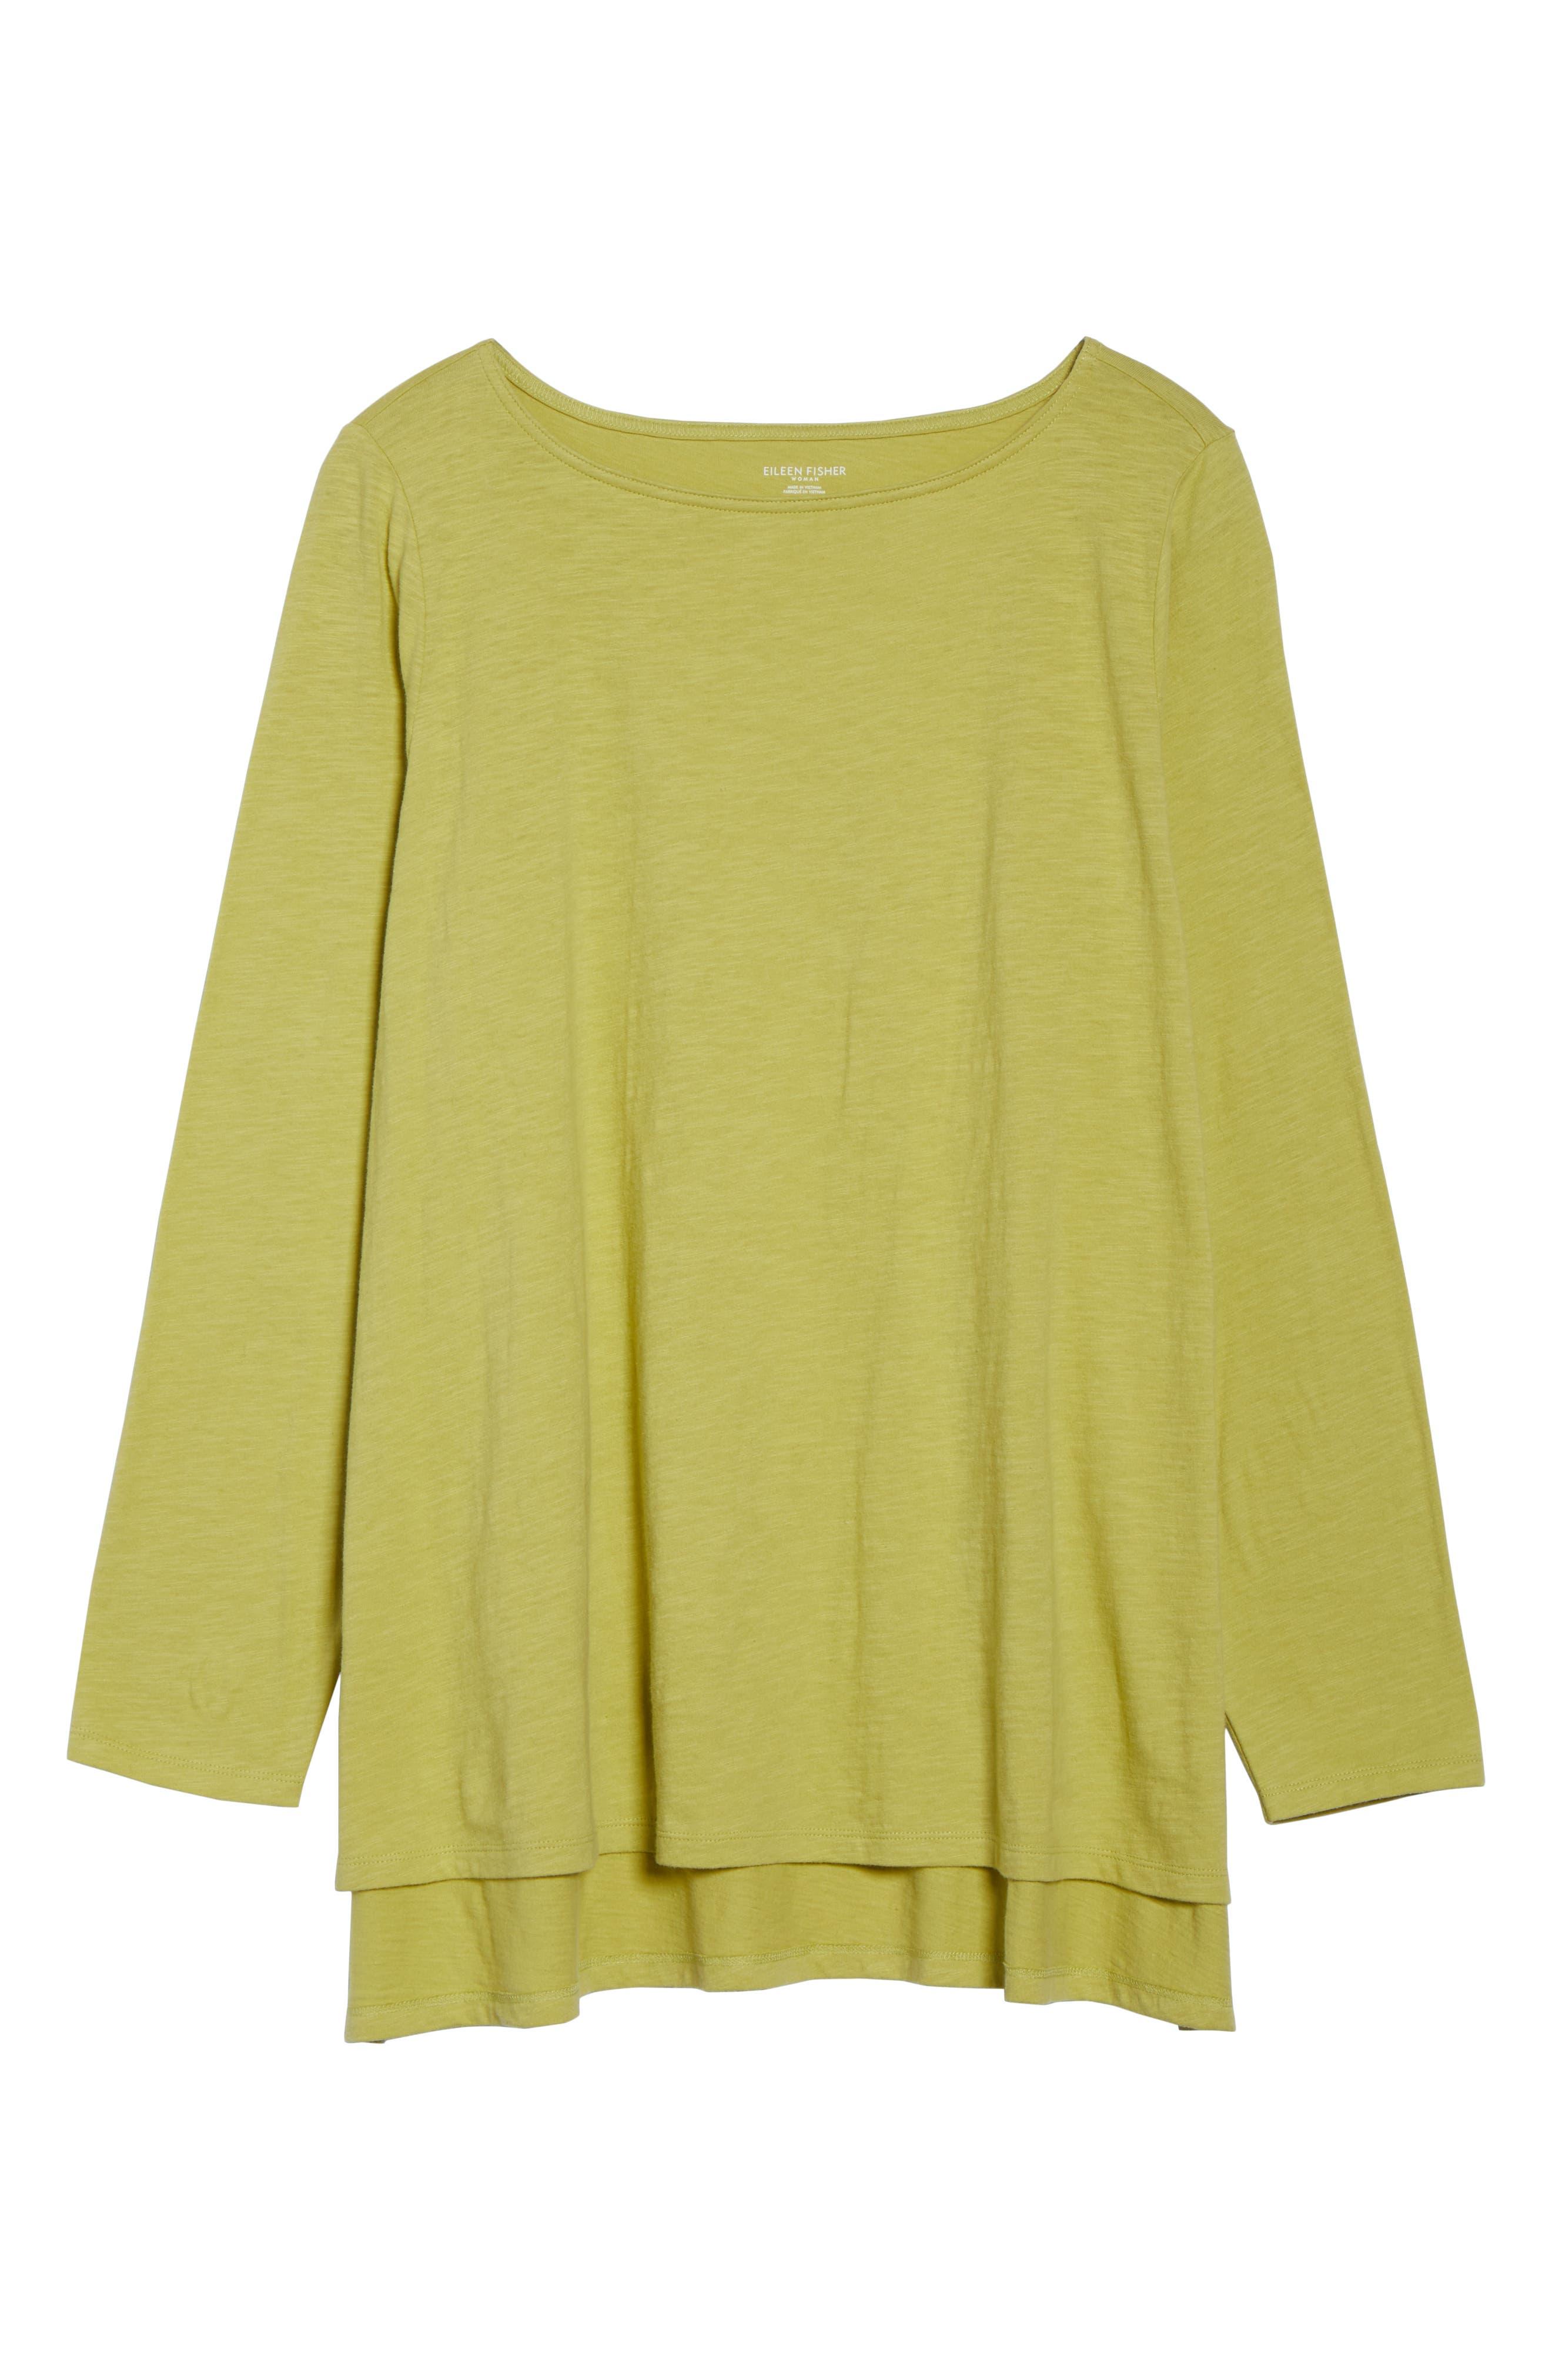 Organic Cotton Jersey Top,                             Alternate thumbnail 6, color,                             VERBENA